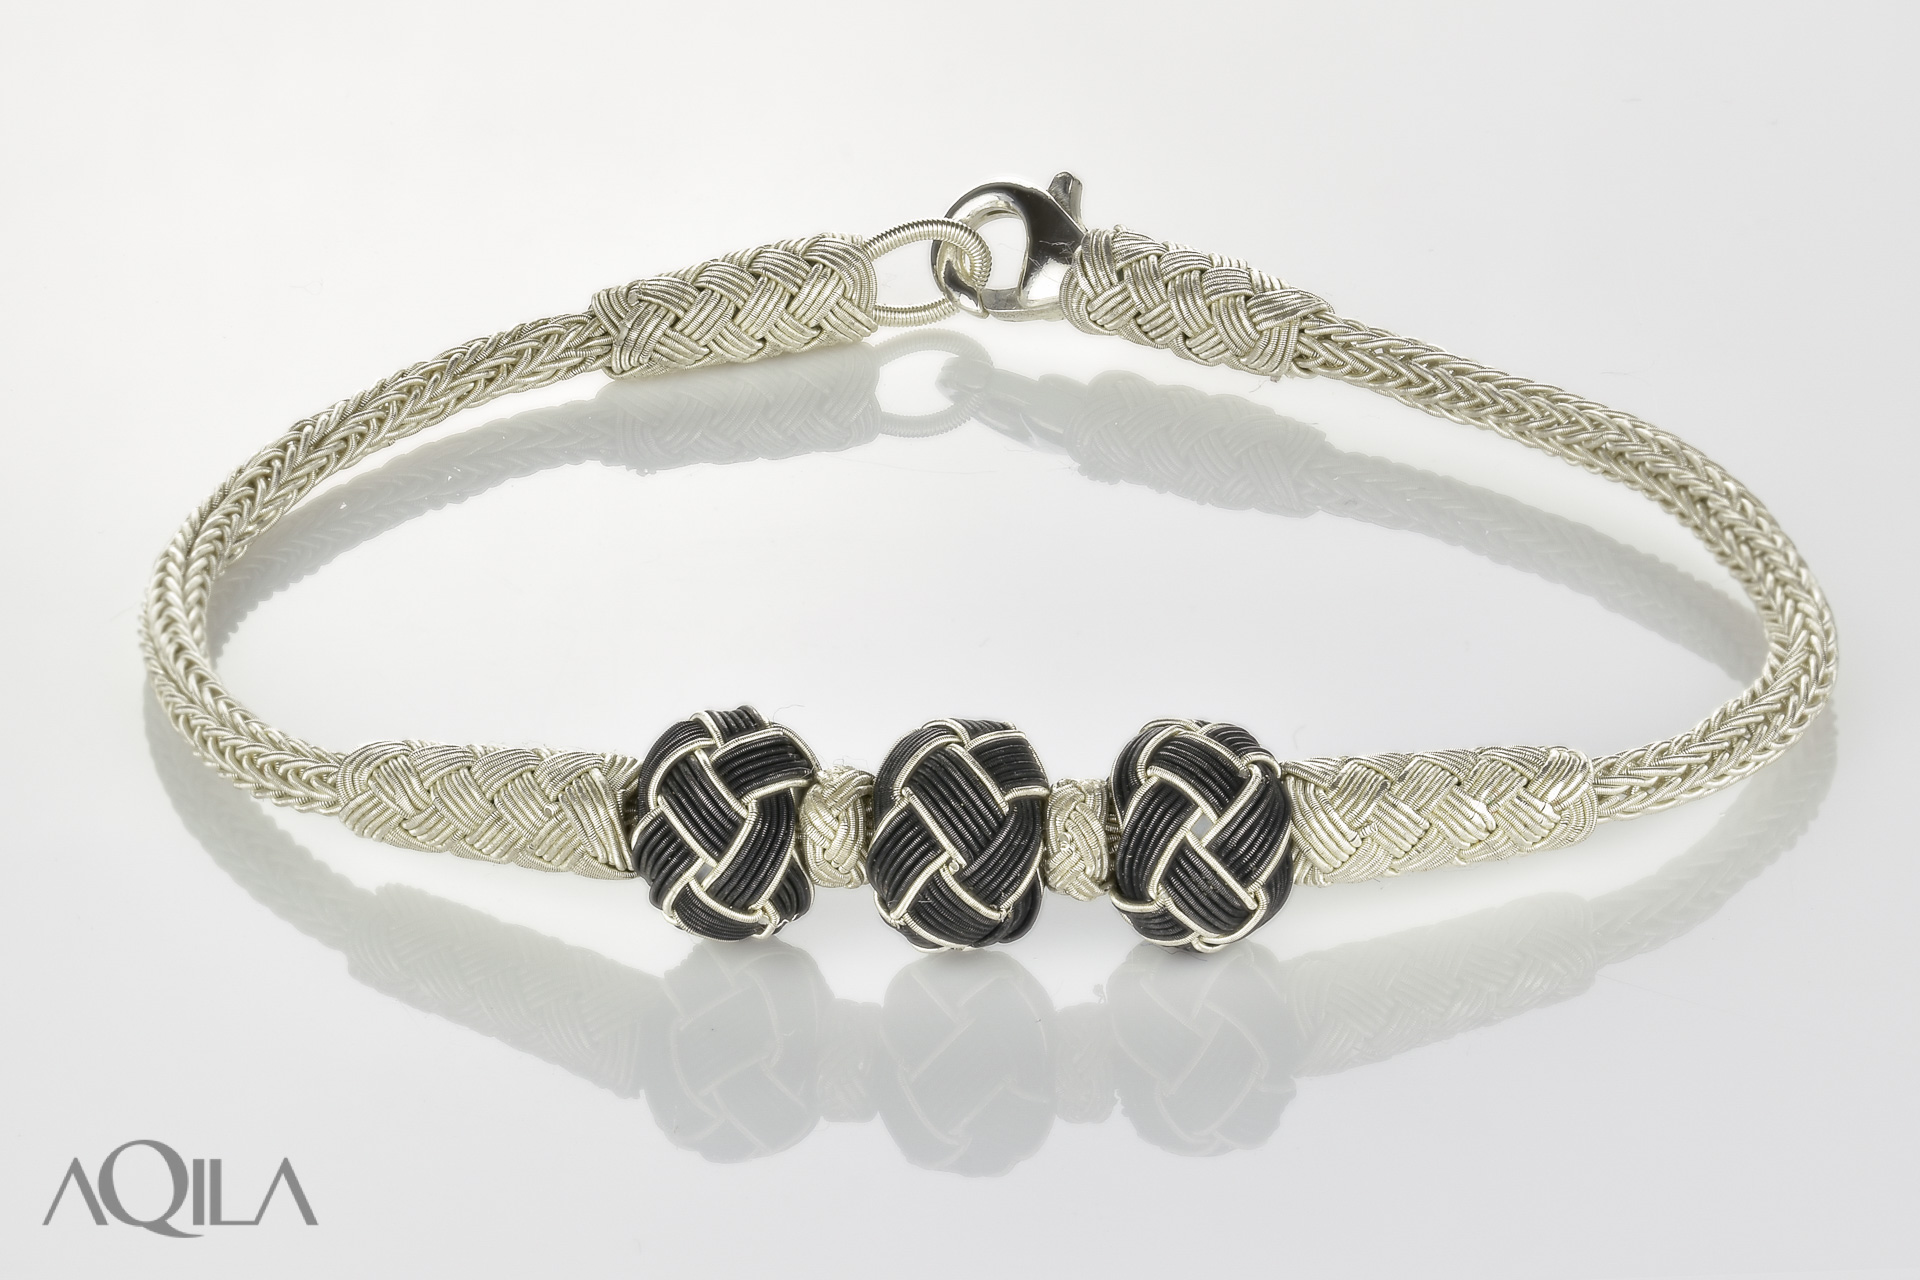 999 Silber Kordel Armband mit 3 Knotenperlen, Freundschaftsband, Kazaziye,  10527 f491150132